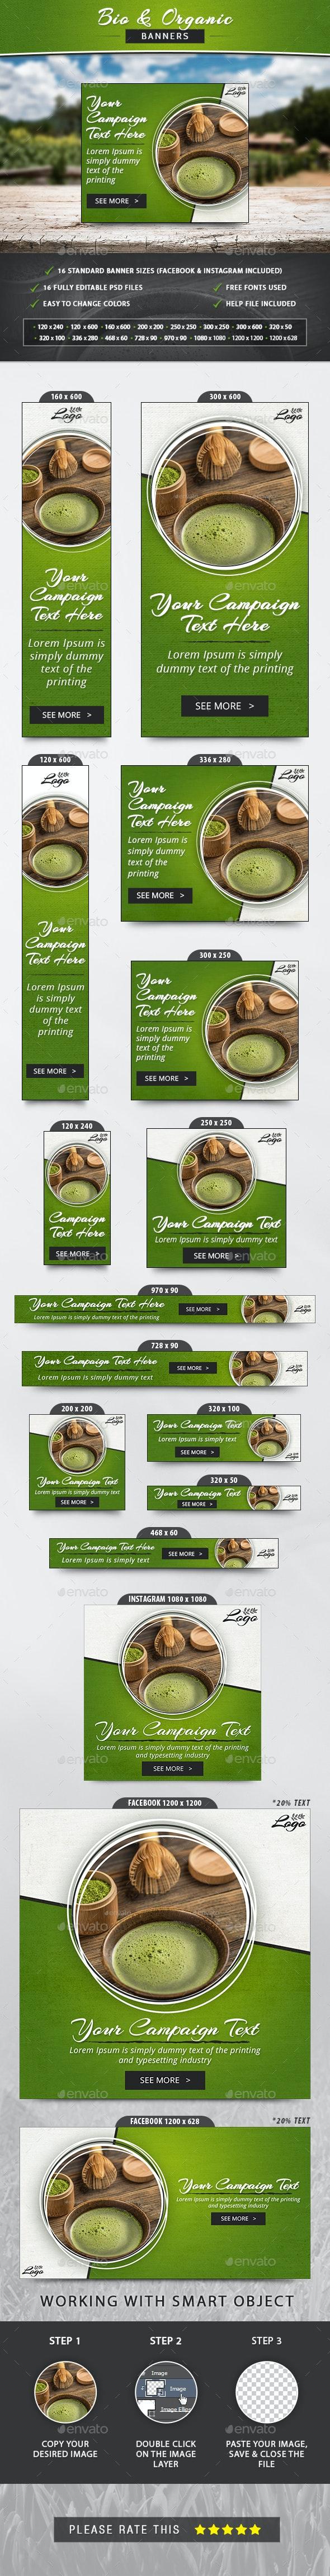 Bio & Organic Banners - Banners & Ads Web Elements